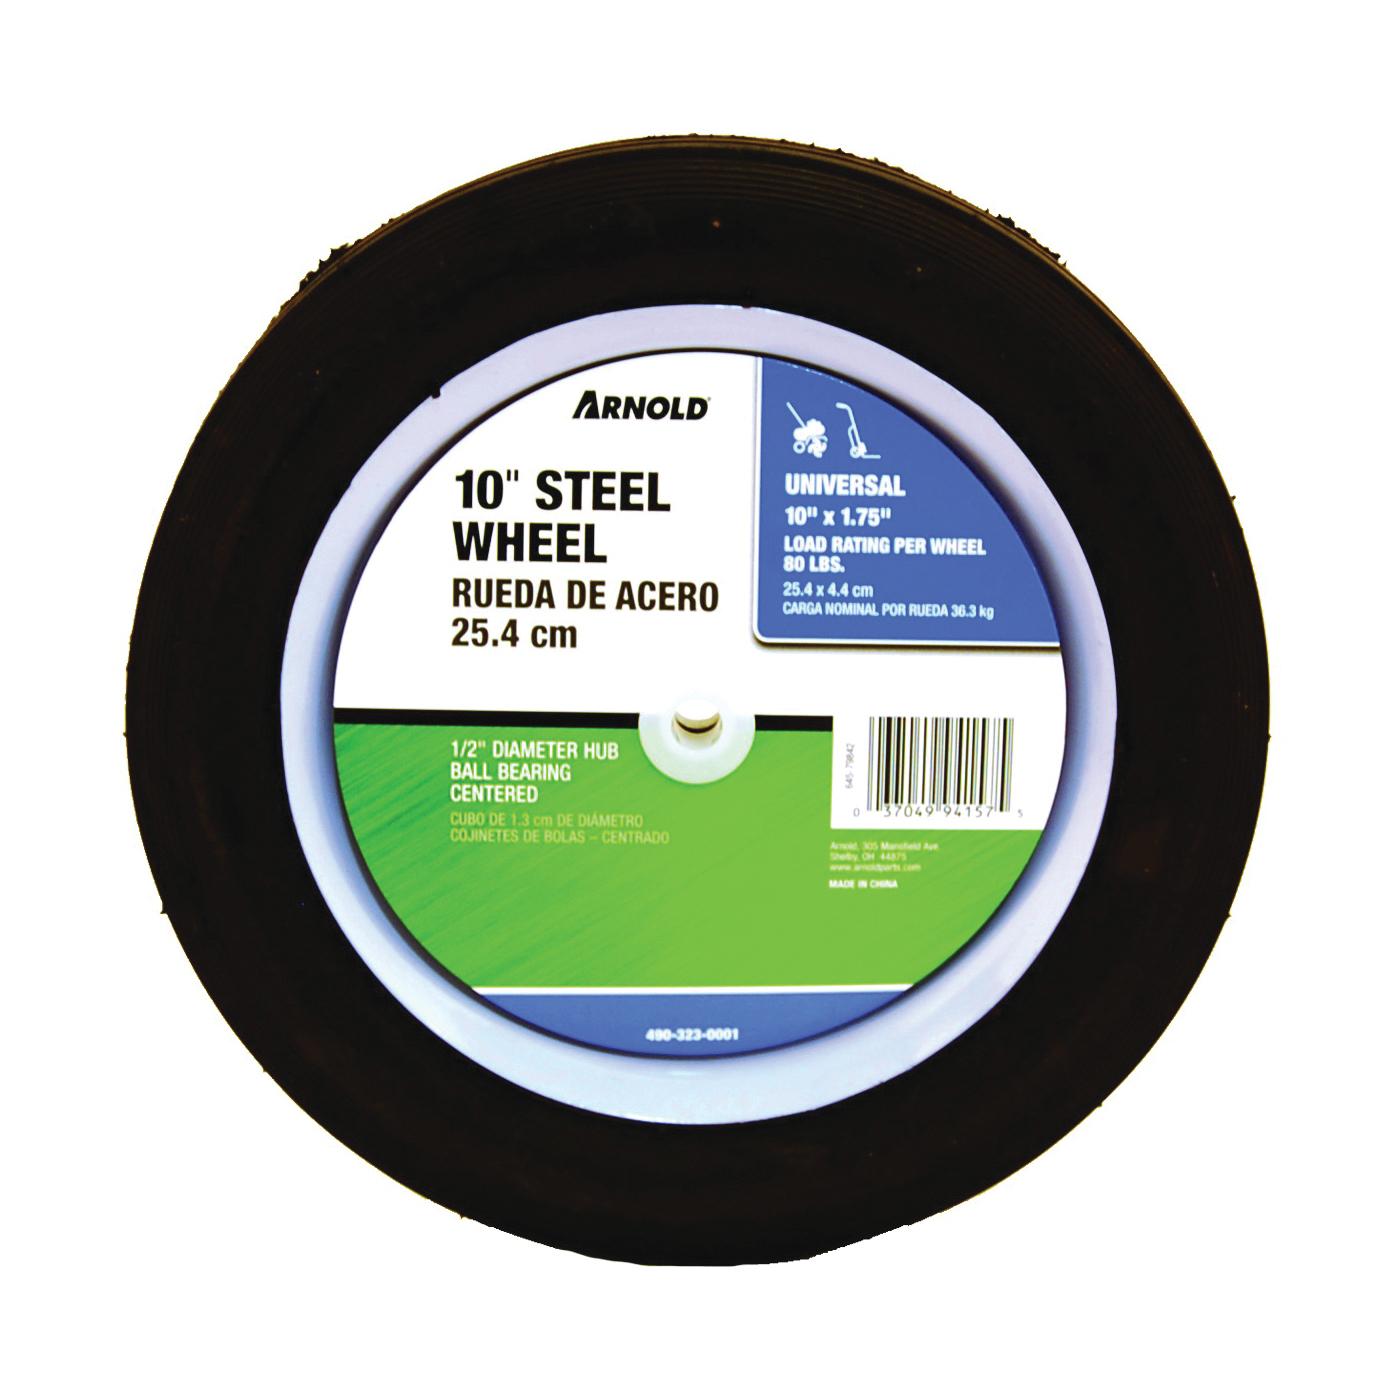 Picture of ARNOLD 490-323-0001 Tread Wheel, Semi-Pneumatic, Steel